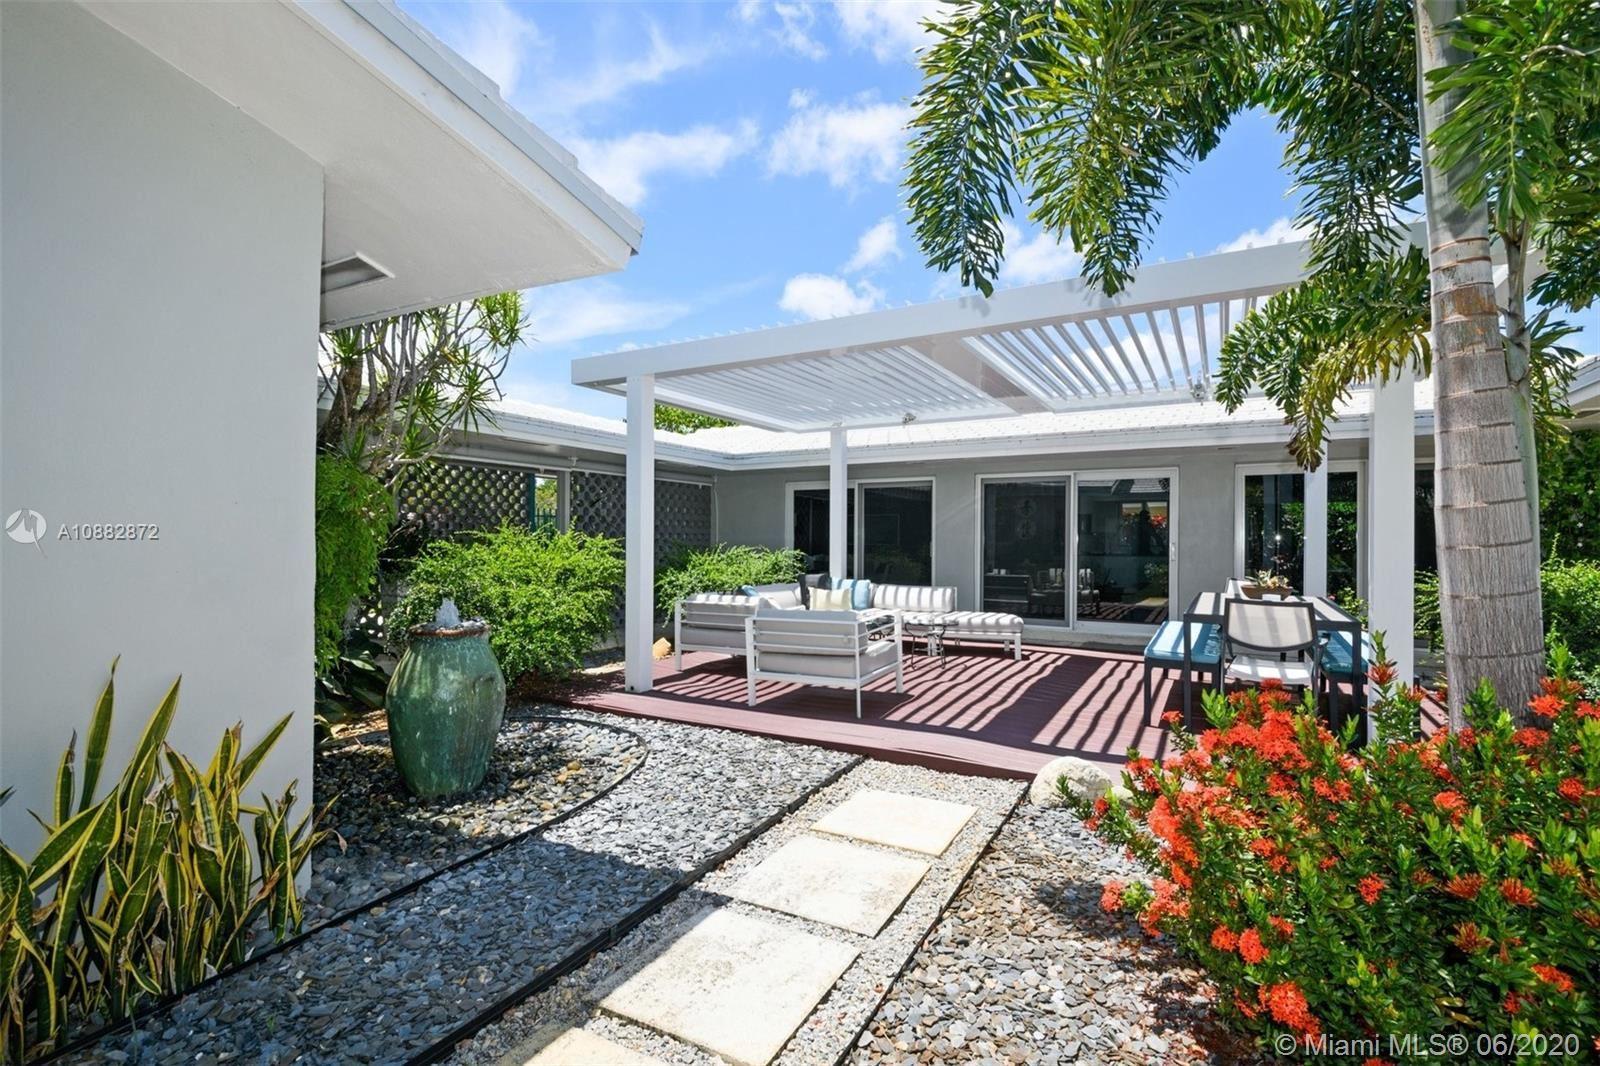 Photo of 4512 NE 21st Ln, Fort Lauderdale, FL 33308 (MLS # A10882872)